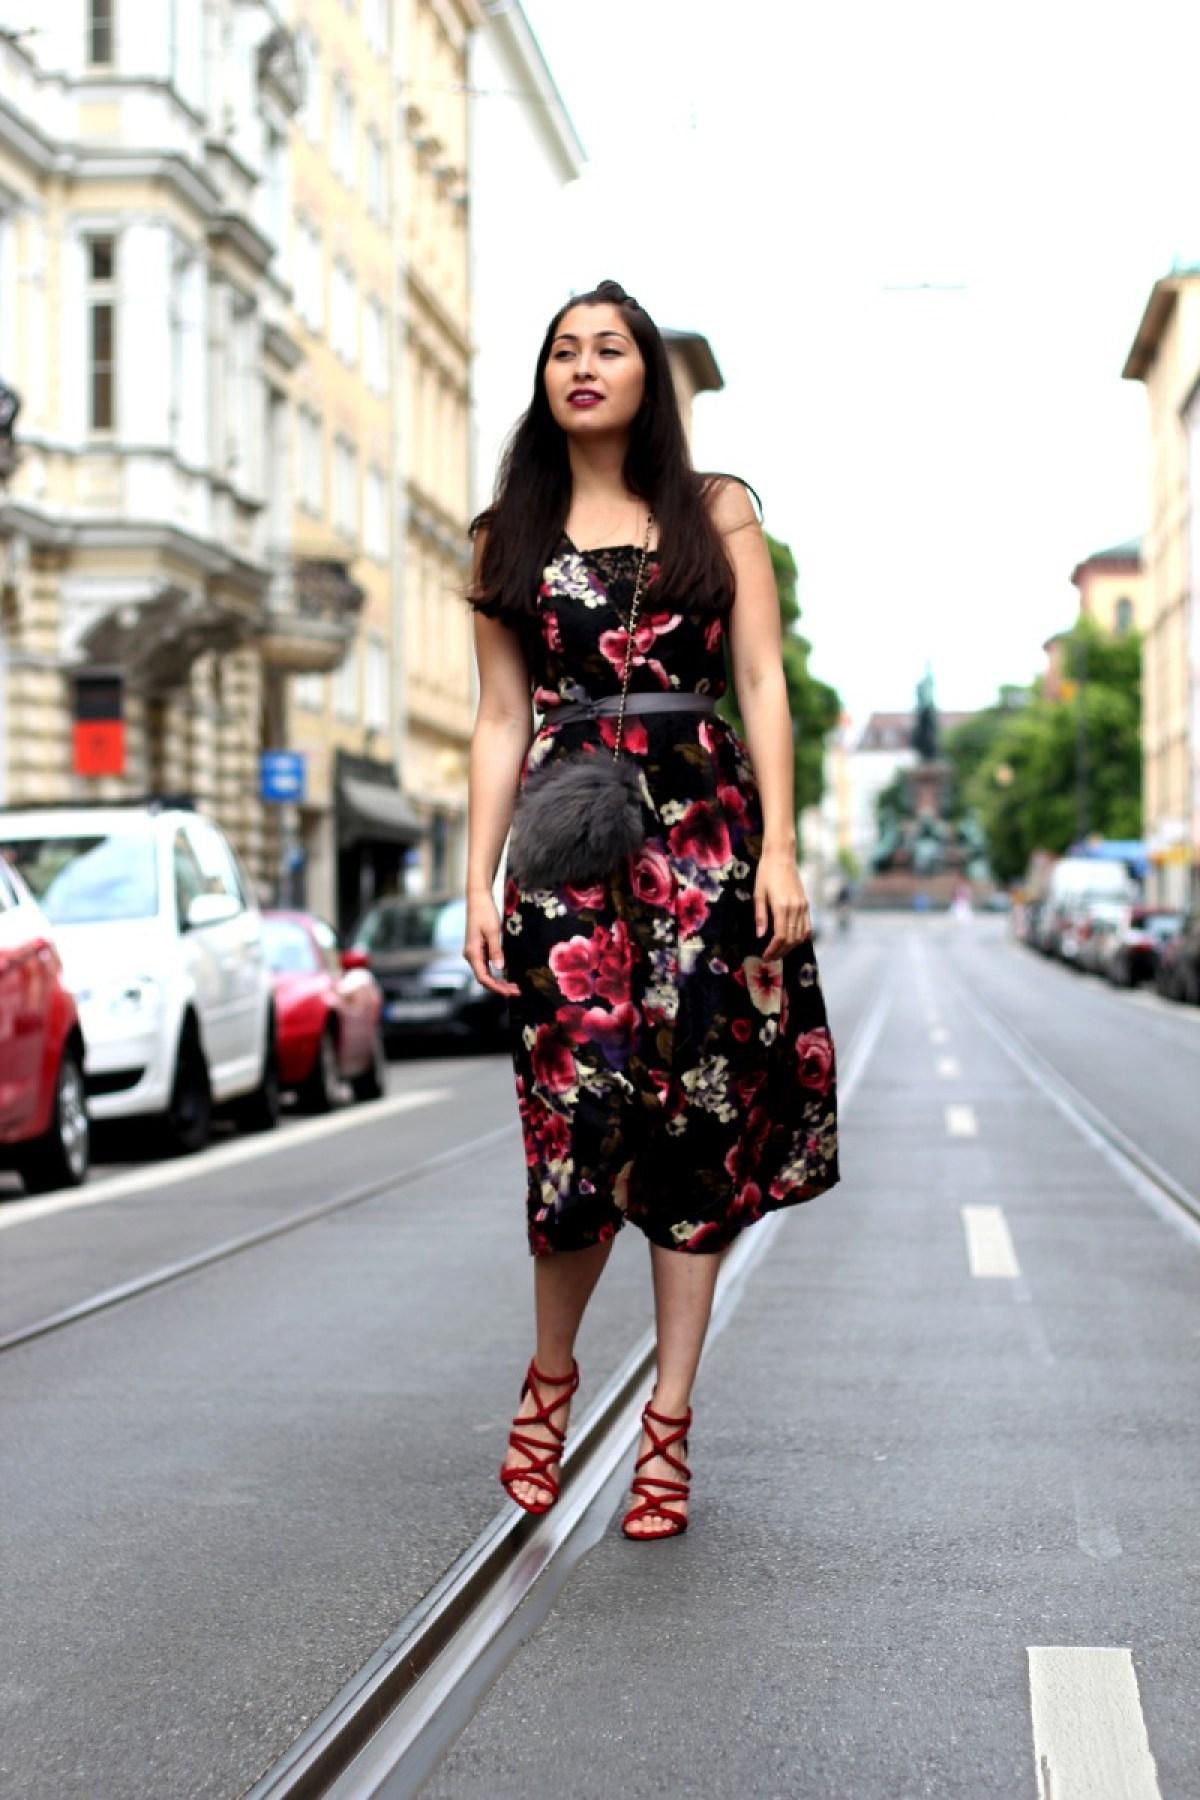 look-dinner-date-streetstyle-spring-summer-midi-trends-flowers-zara-heels-romantic-chic-little-mistress